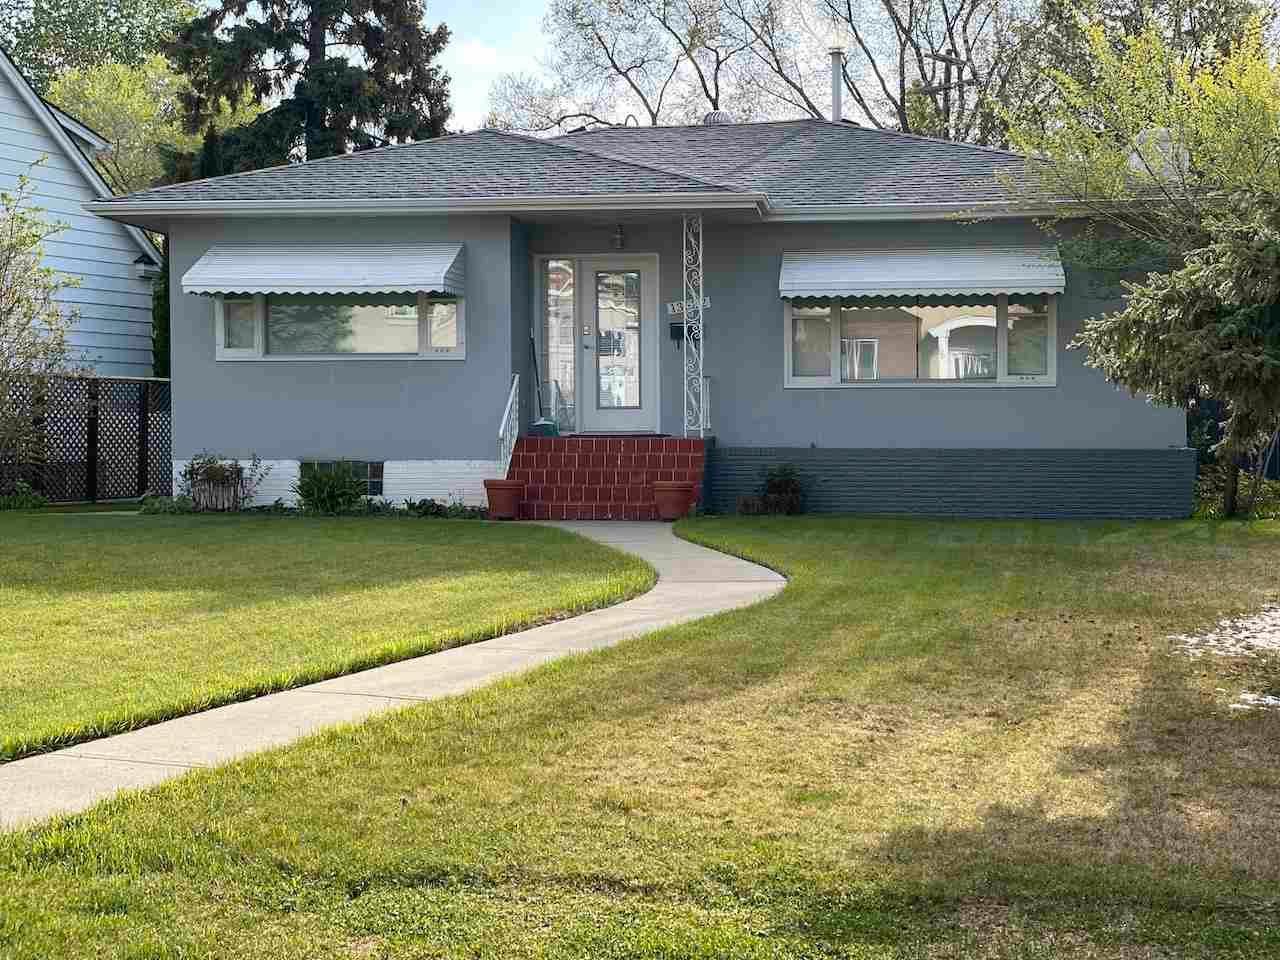 Main Photo: 13622 100 Avenue in Edmonton: Zone 11 House for sale : MLS®# E4245024